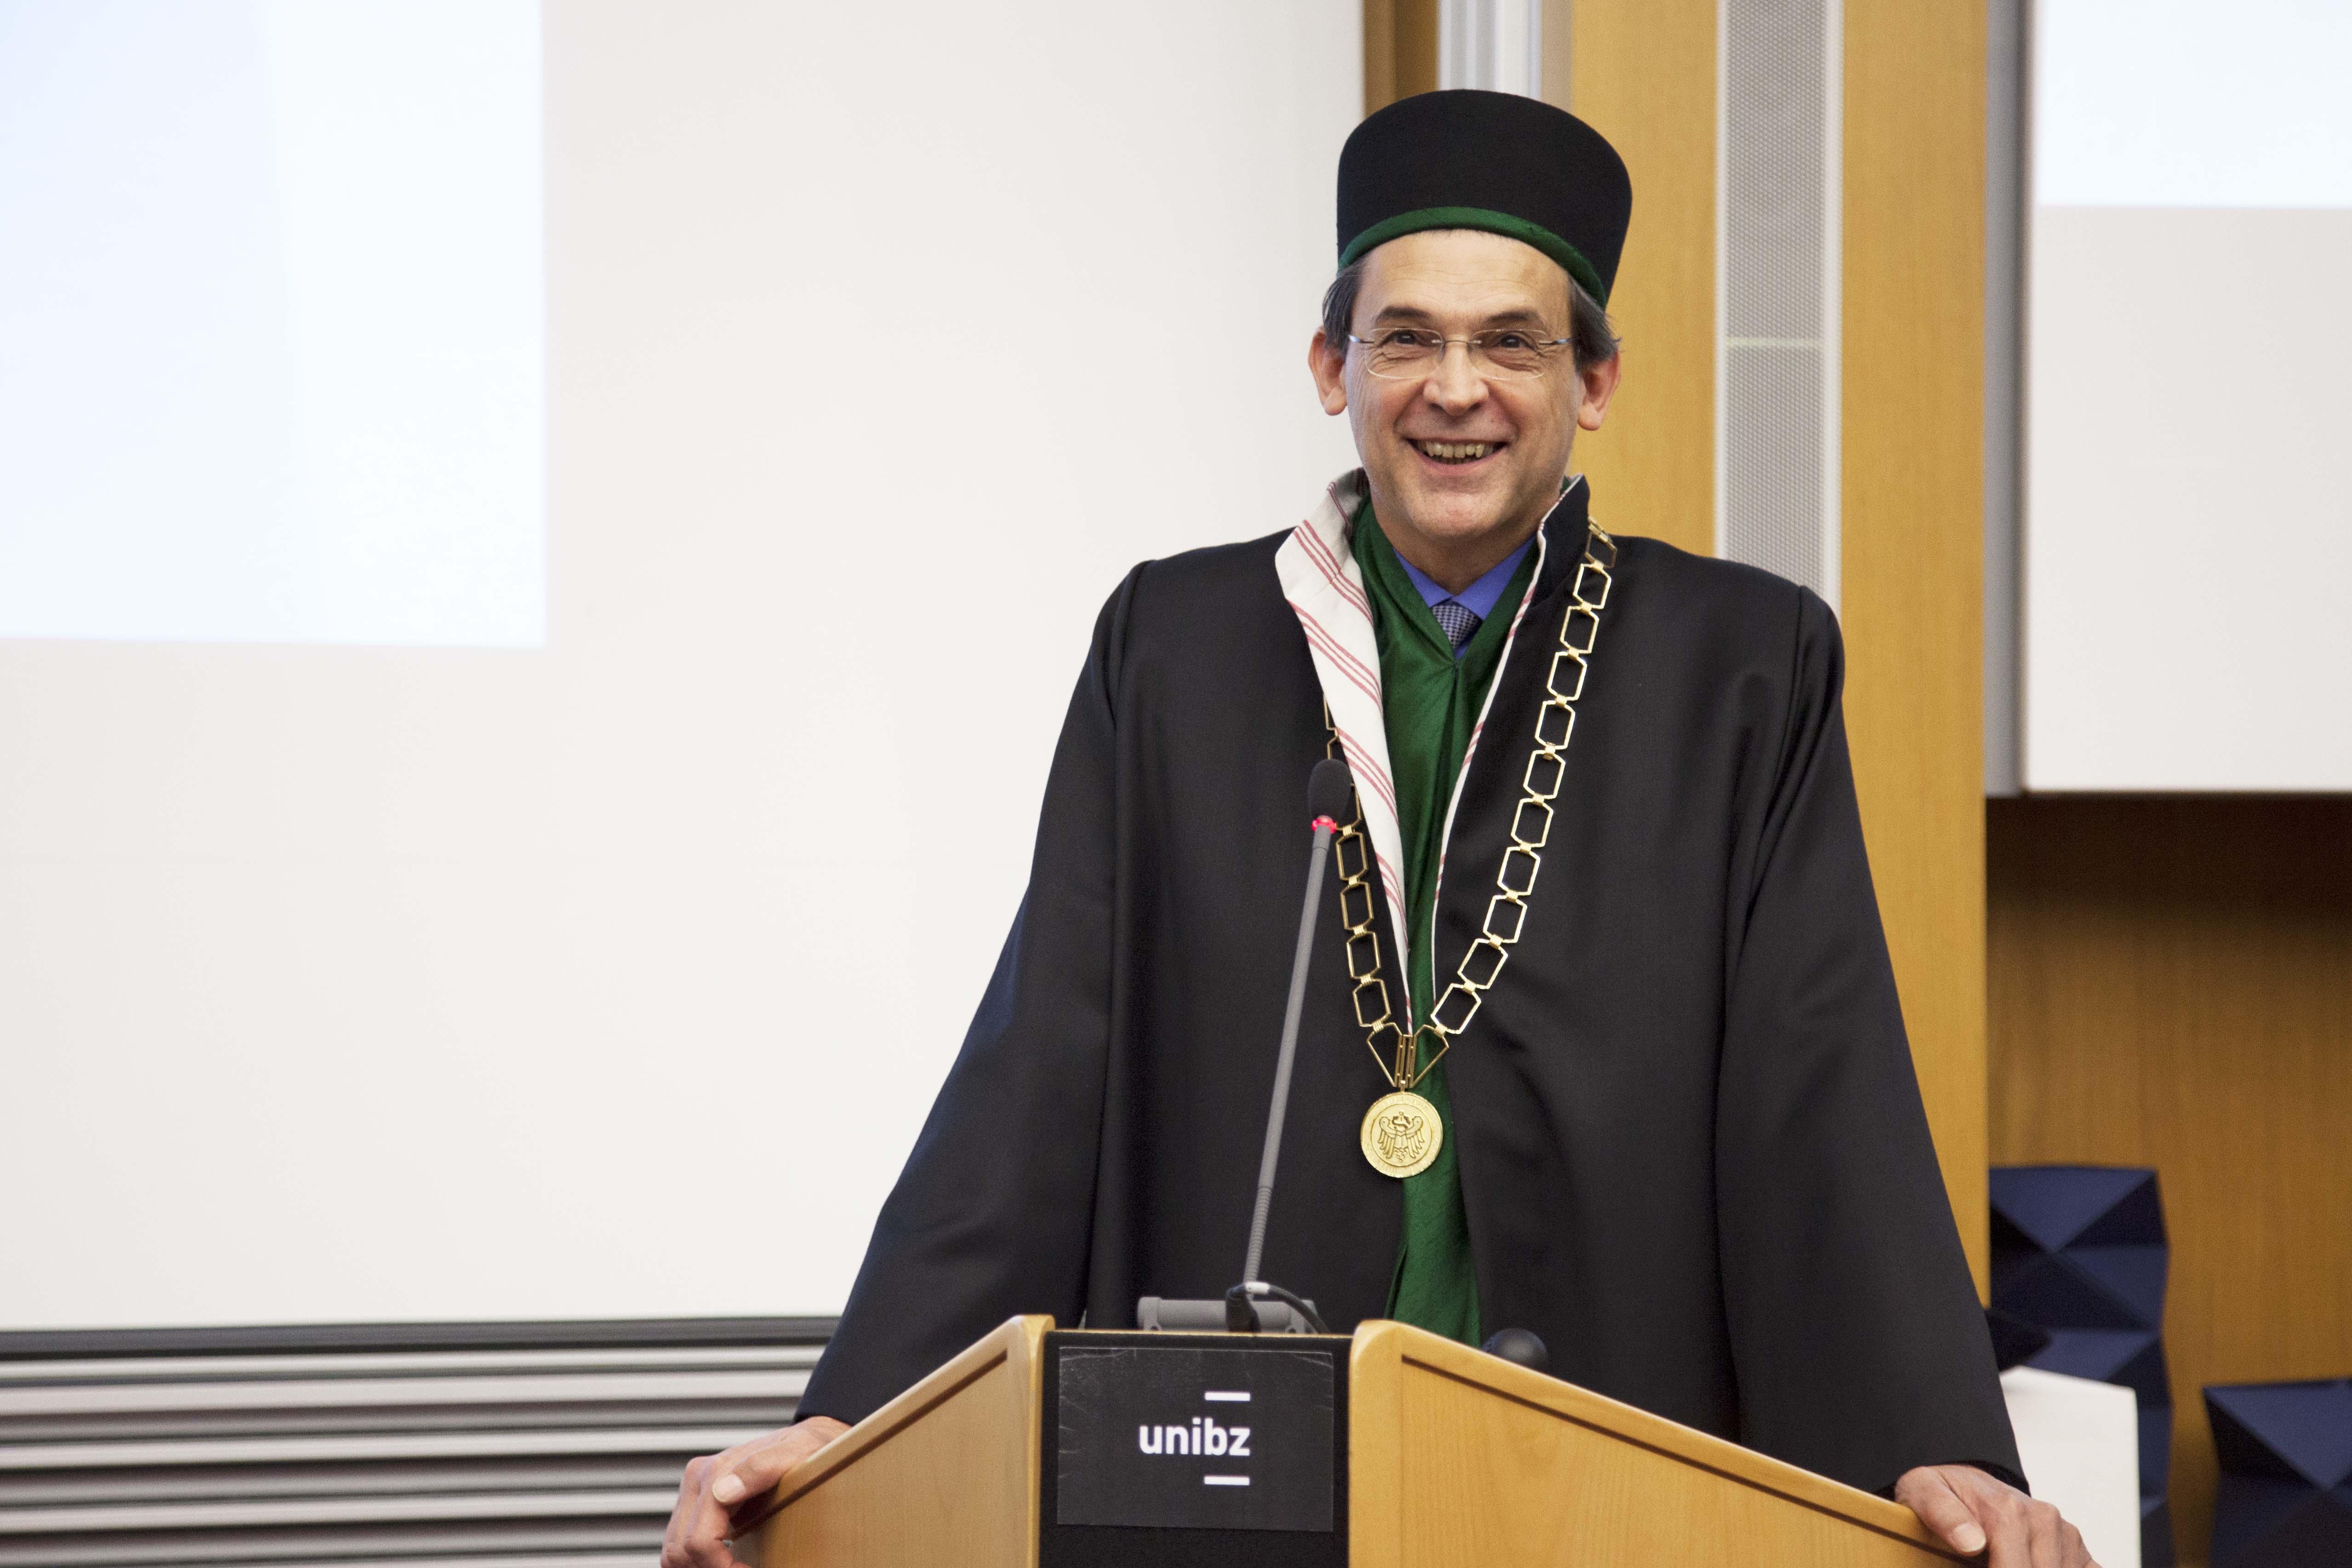 prof. lugli